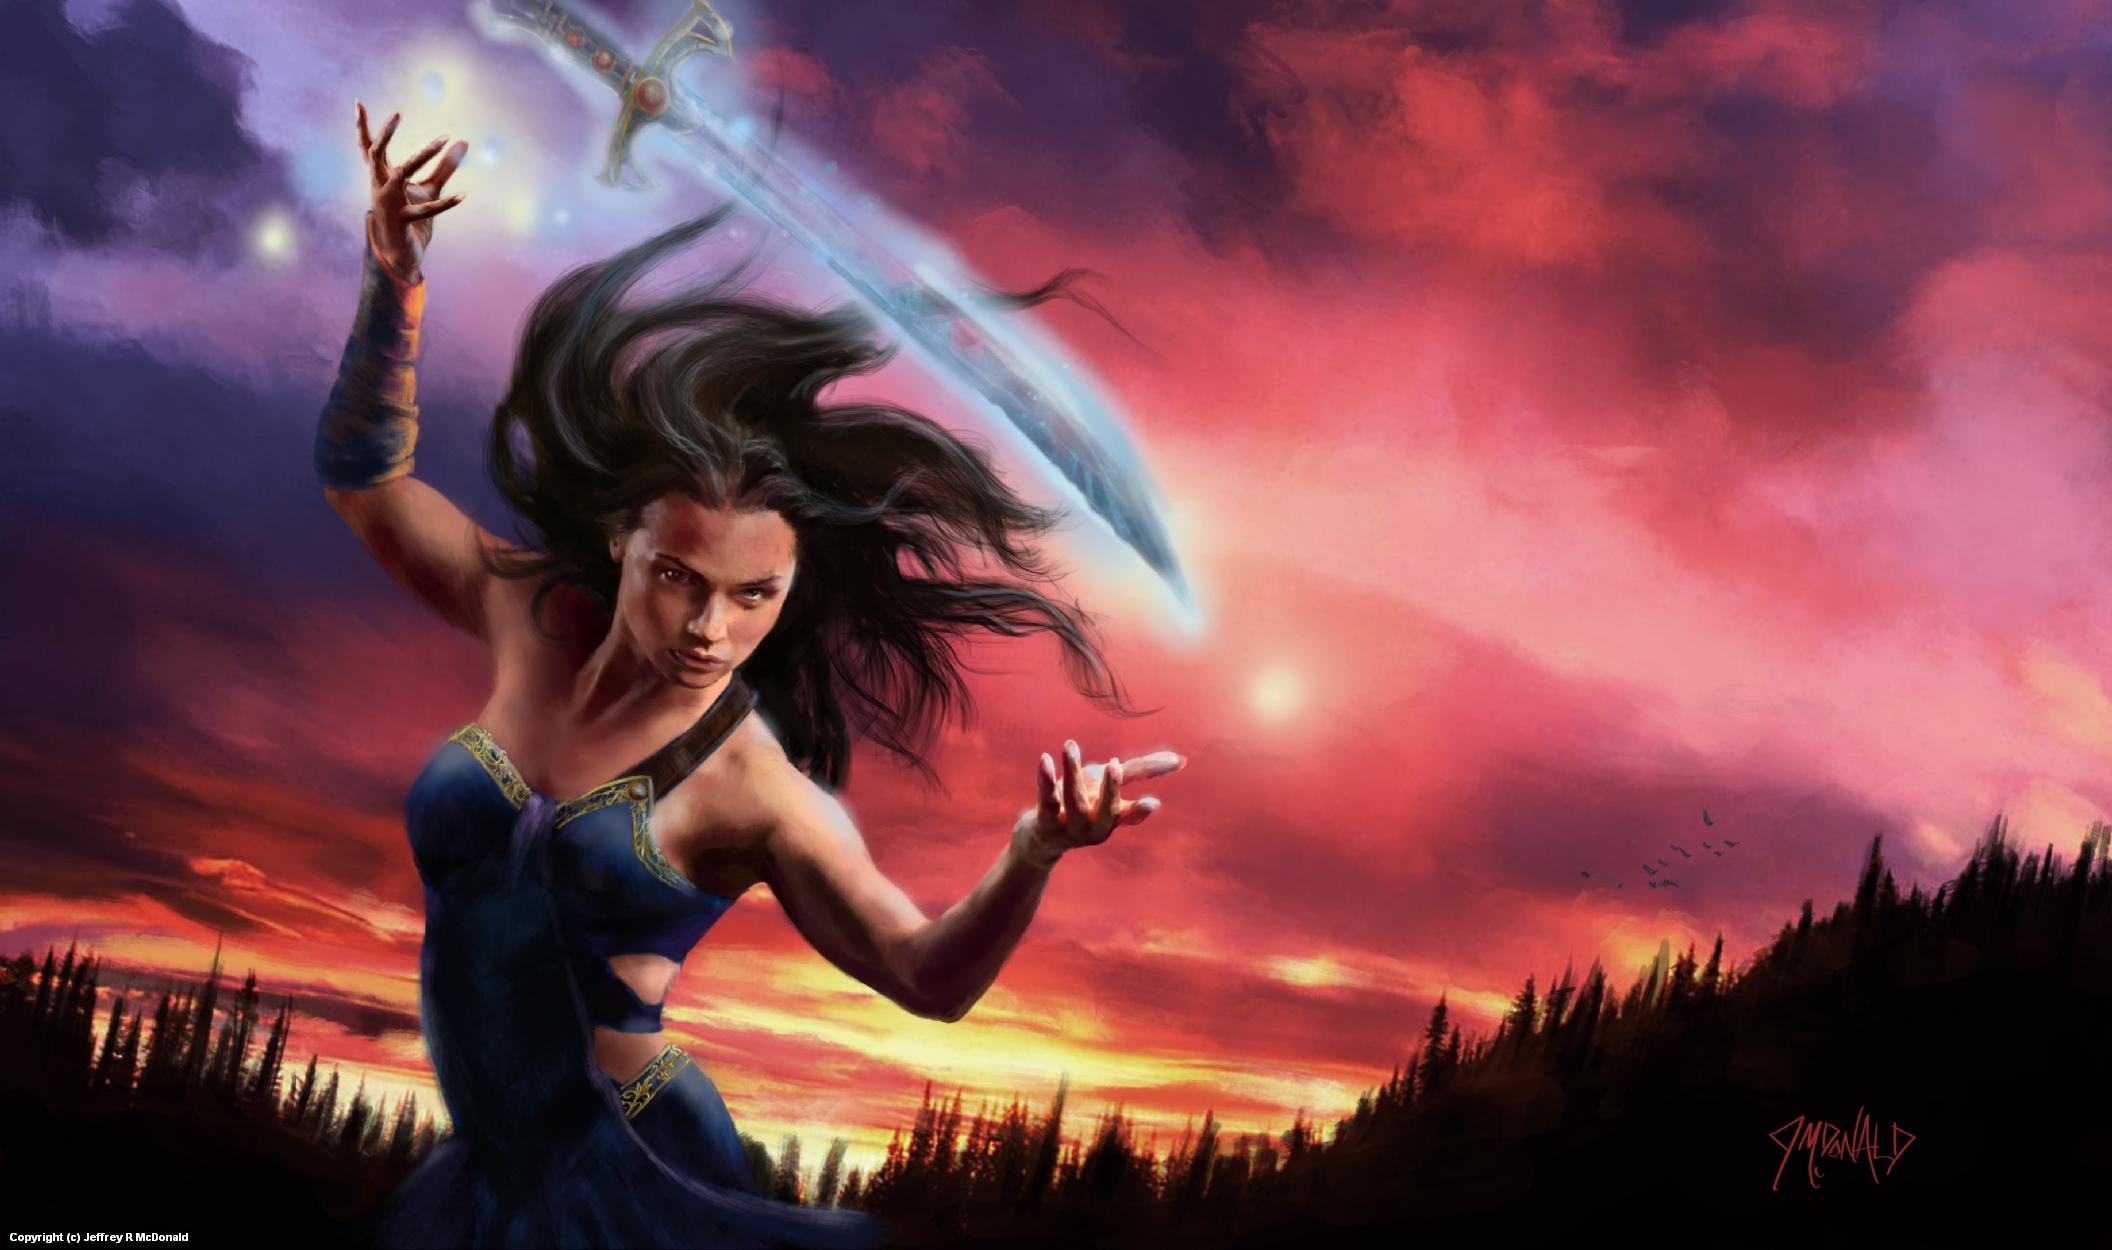 Spirit Sword Artwork by Jeffrey McDonald